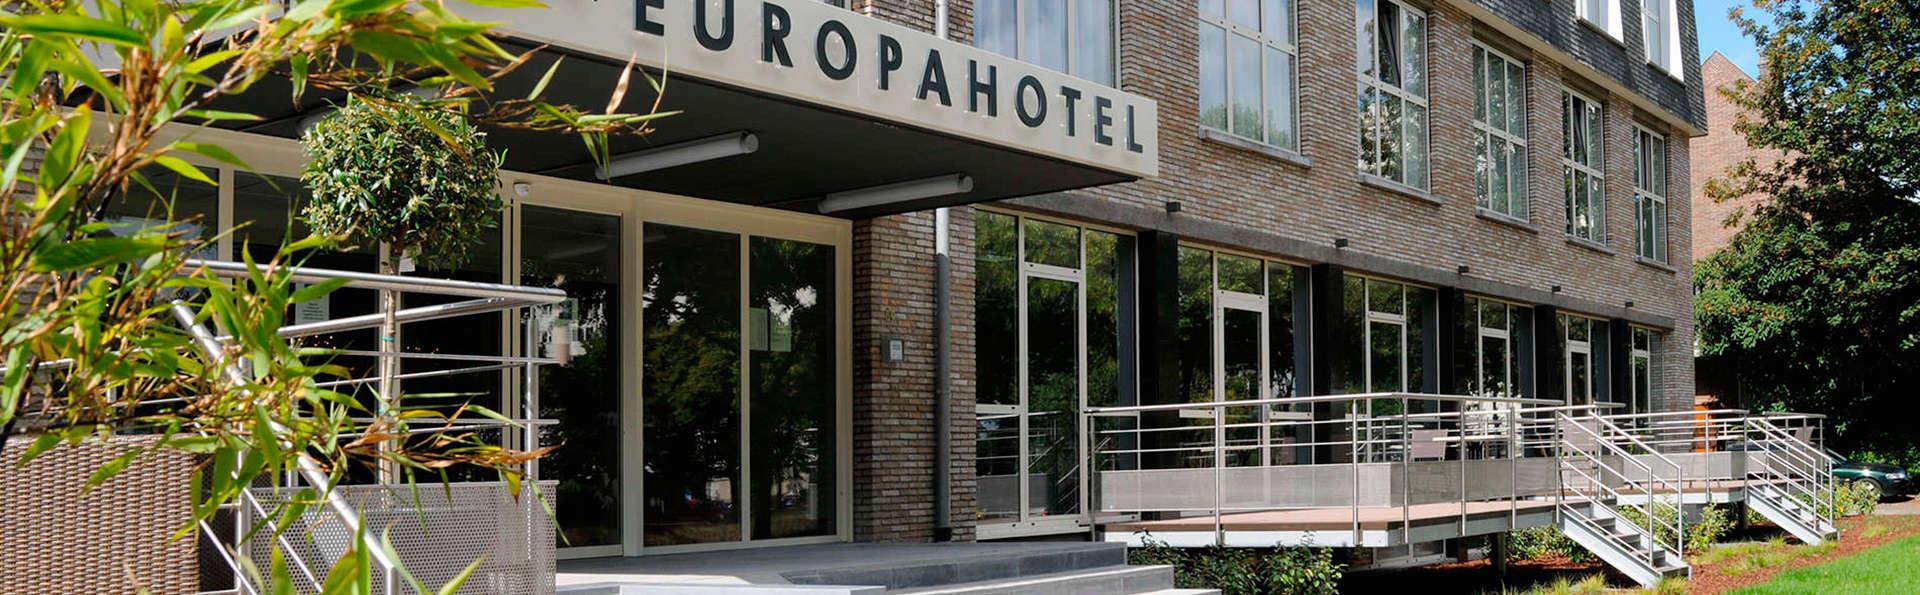 Europa Hotel ( Gent )  - EDIT_front.jpg